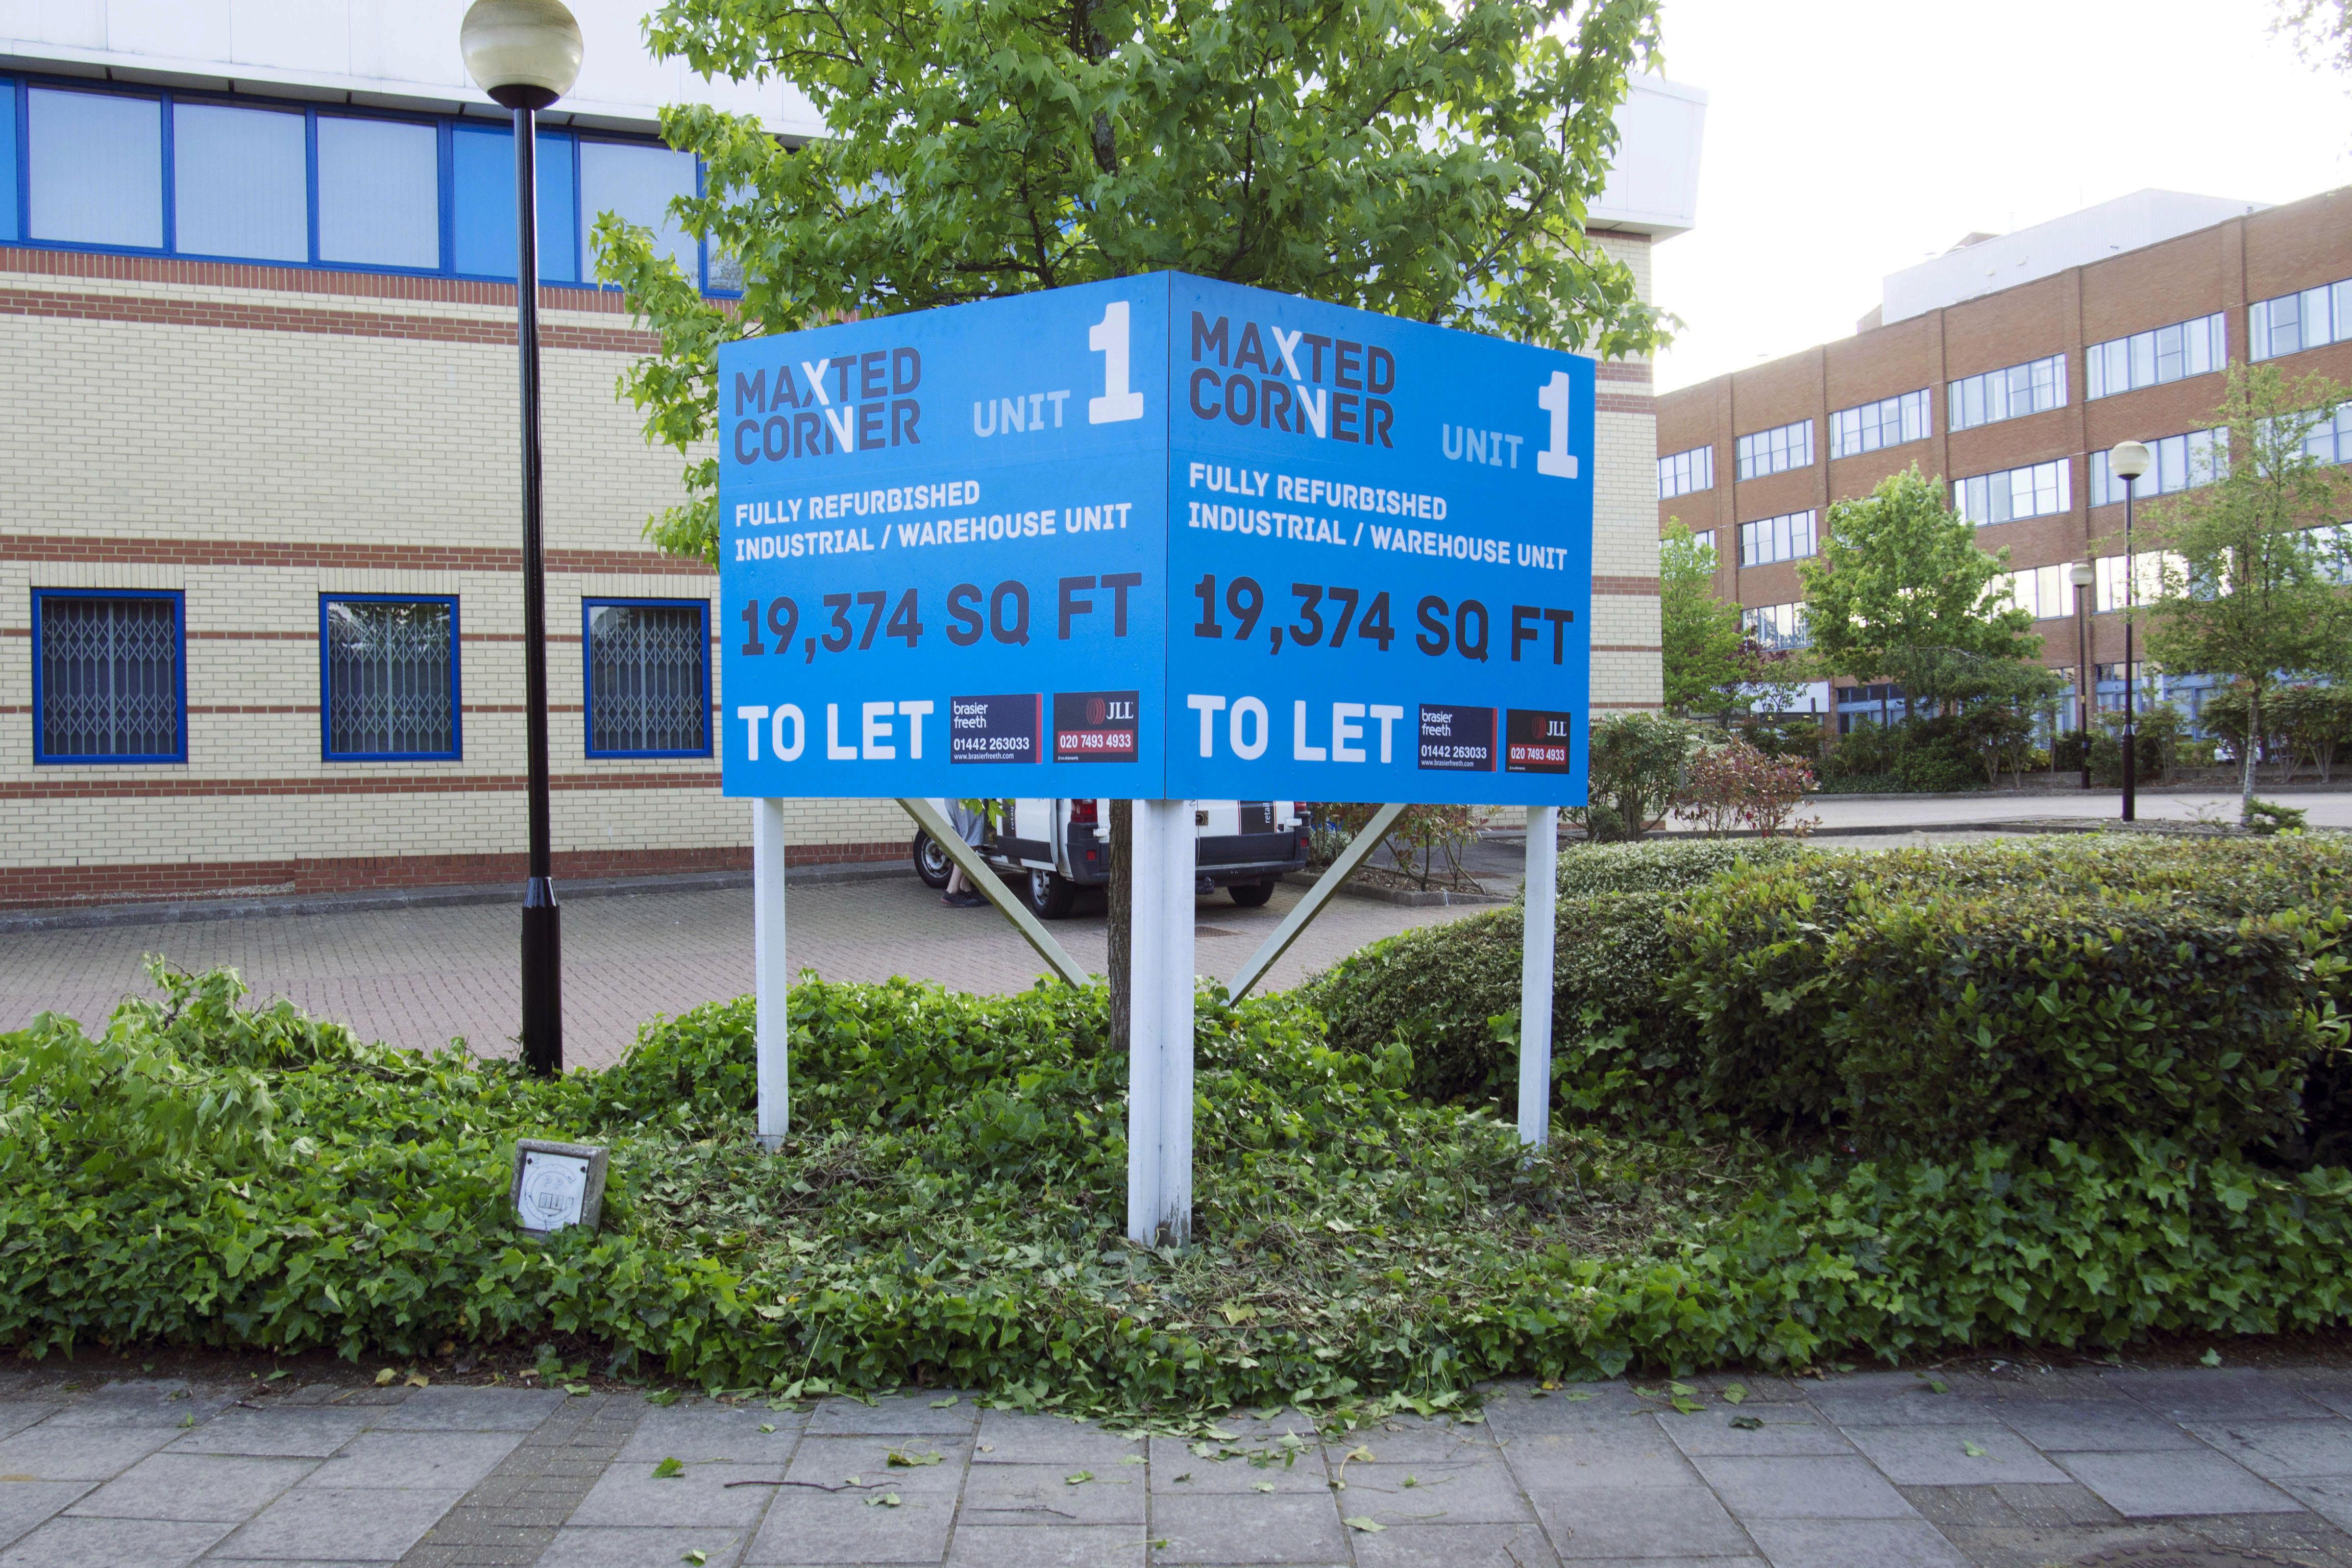 Large V board sign - Hemel Hempstead